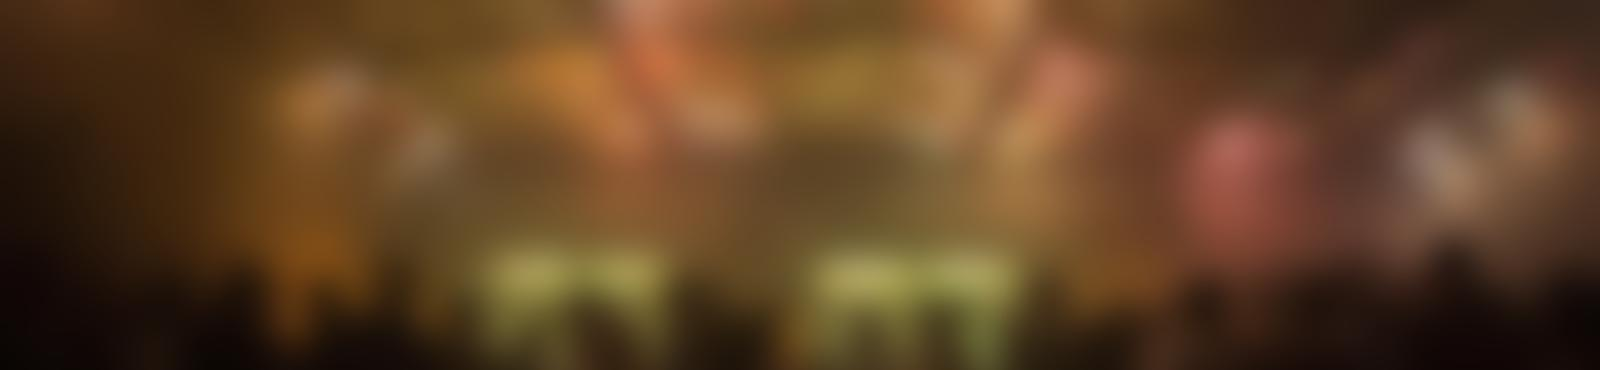 Blurred fa35250d 76ac 4017 8f0d f927e67eb53d